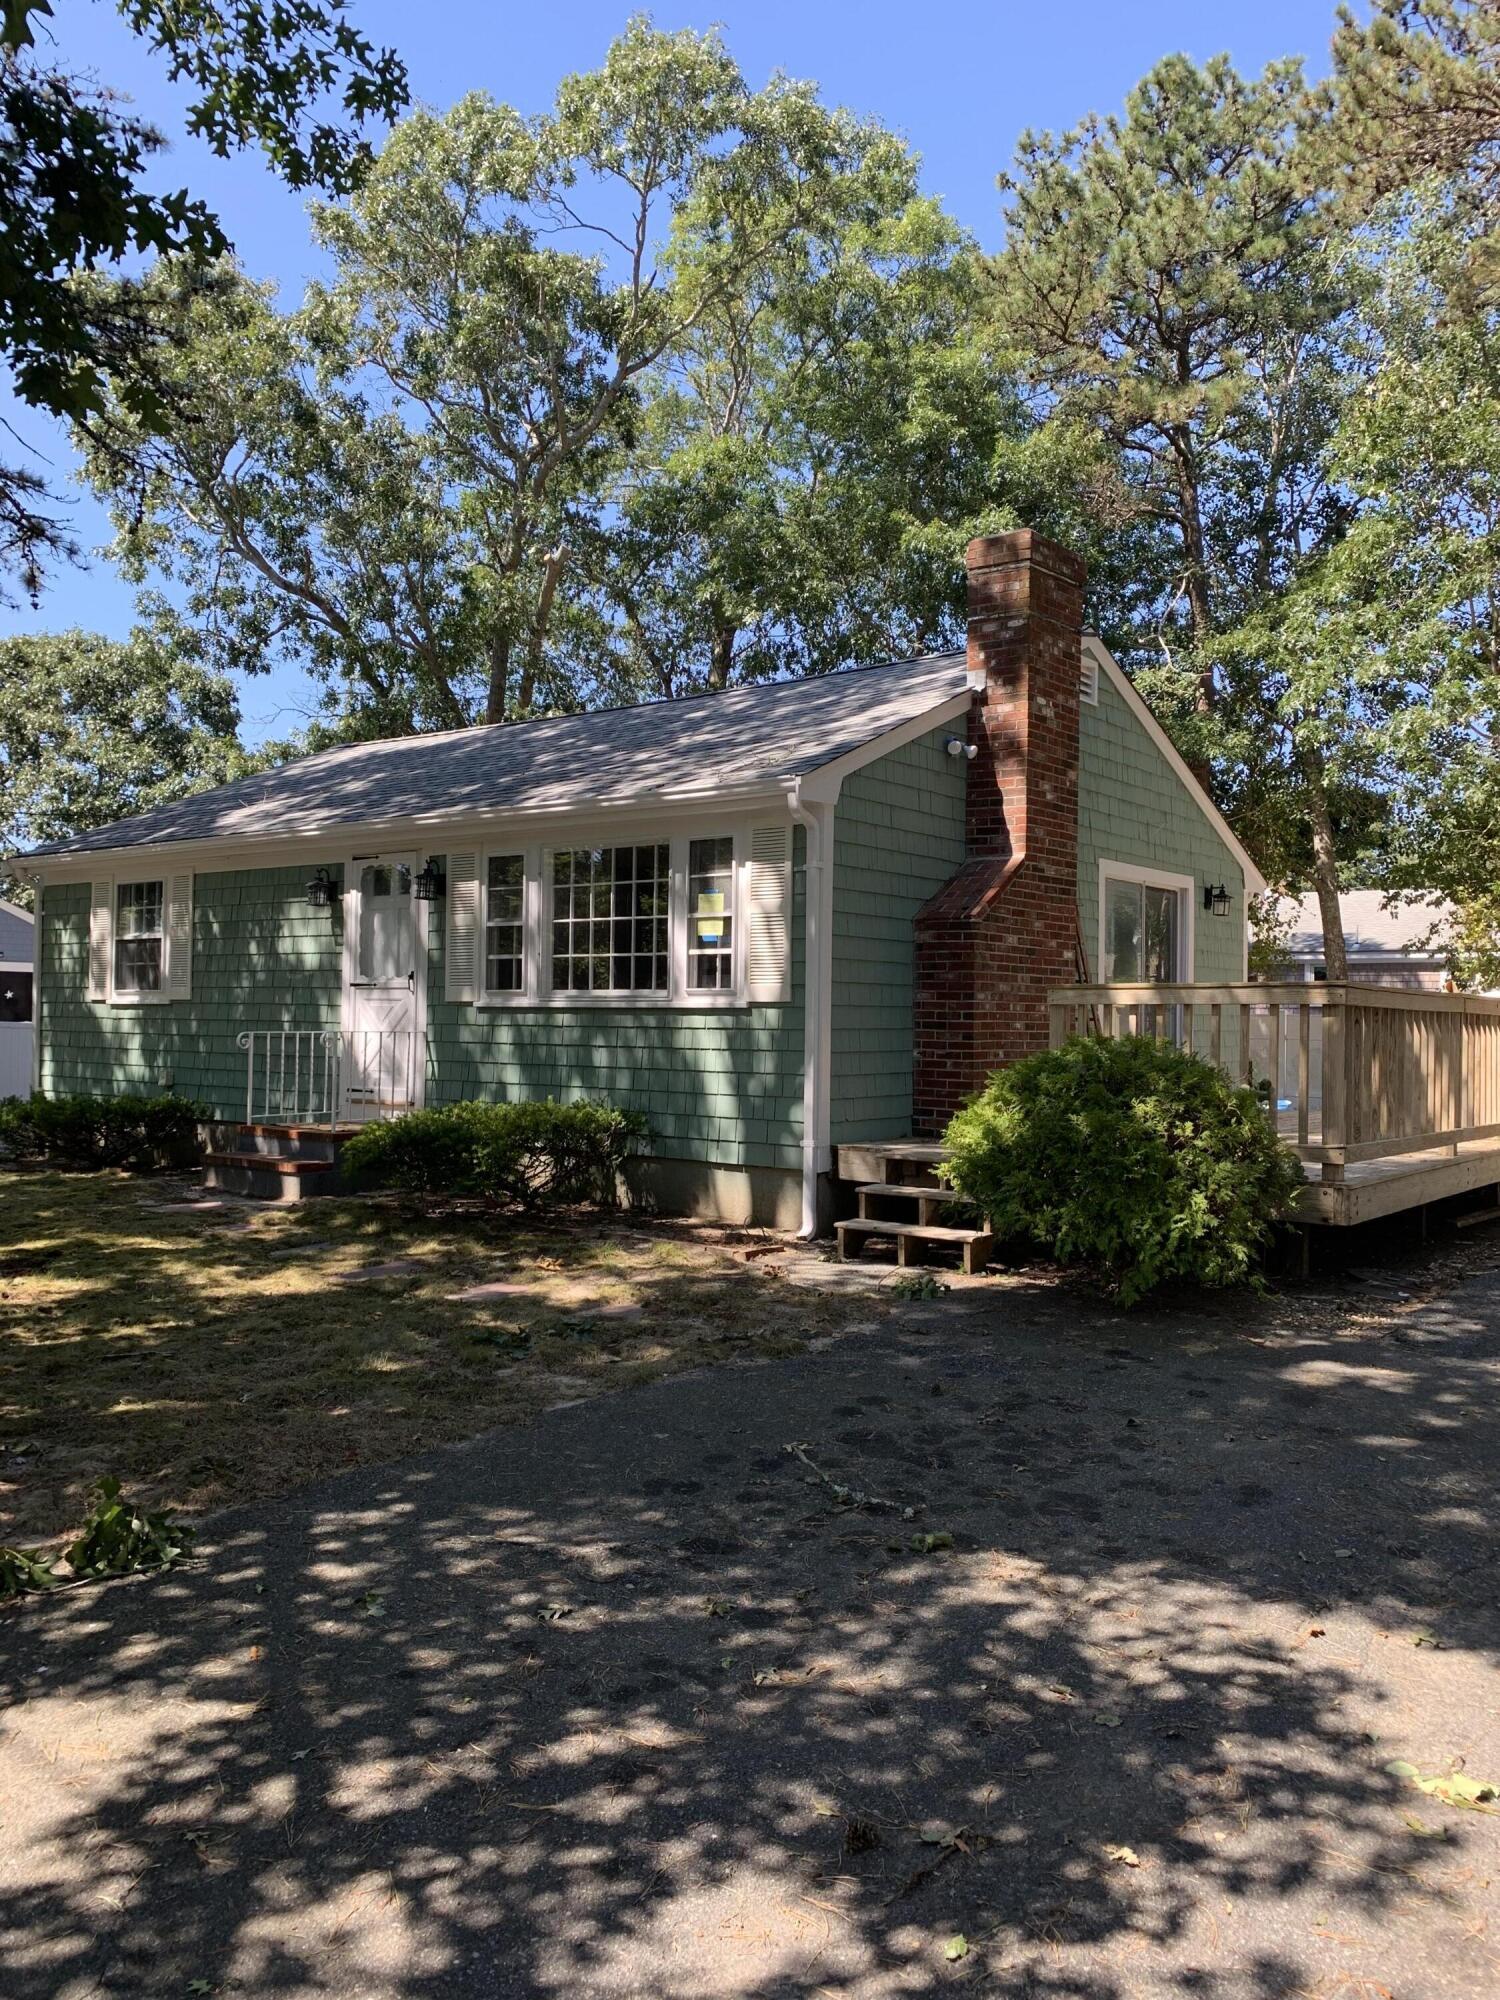 15 Rosemary Lane, West Yarmouth MA, 02673 details